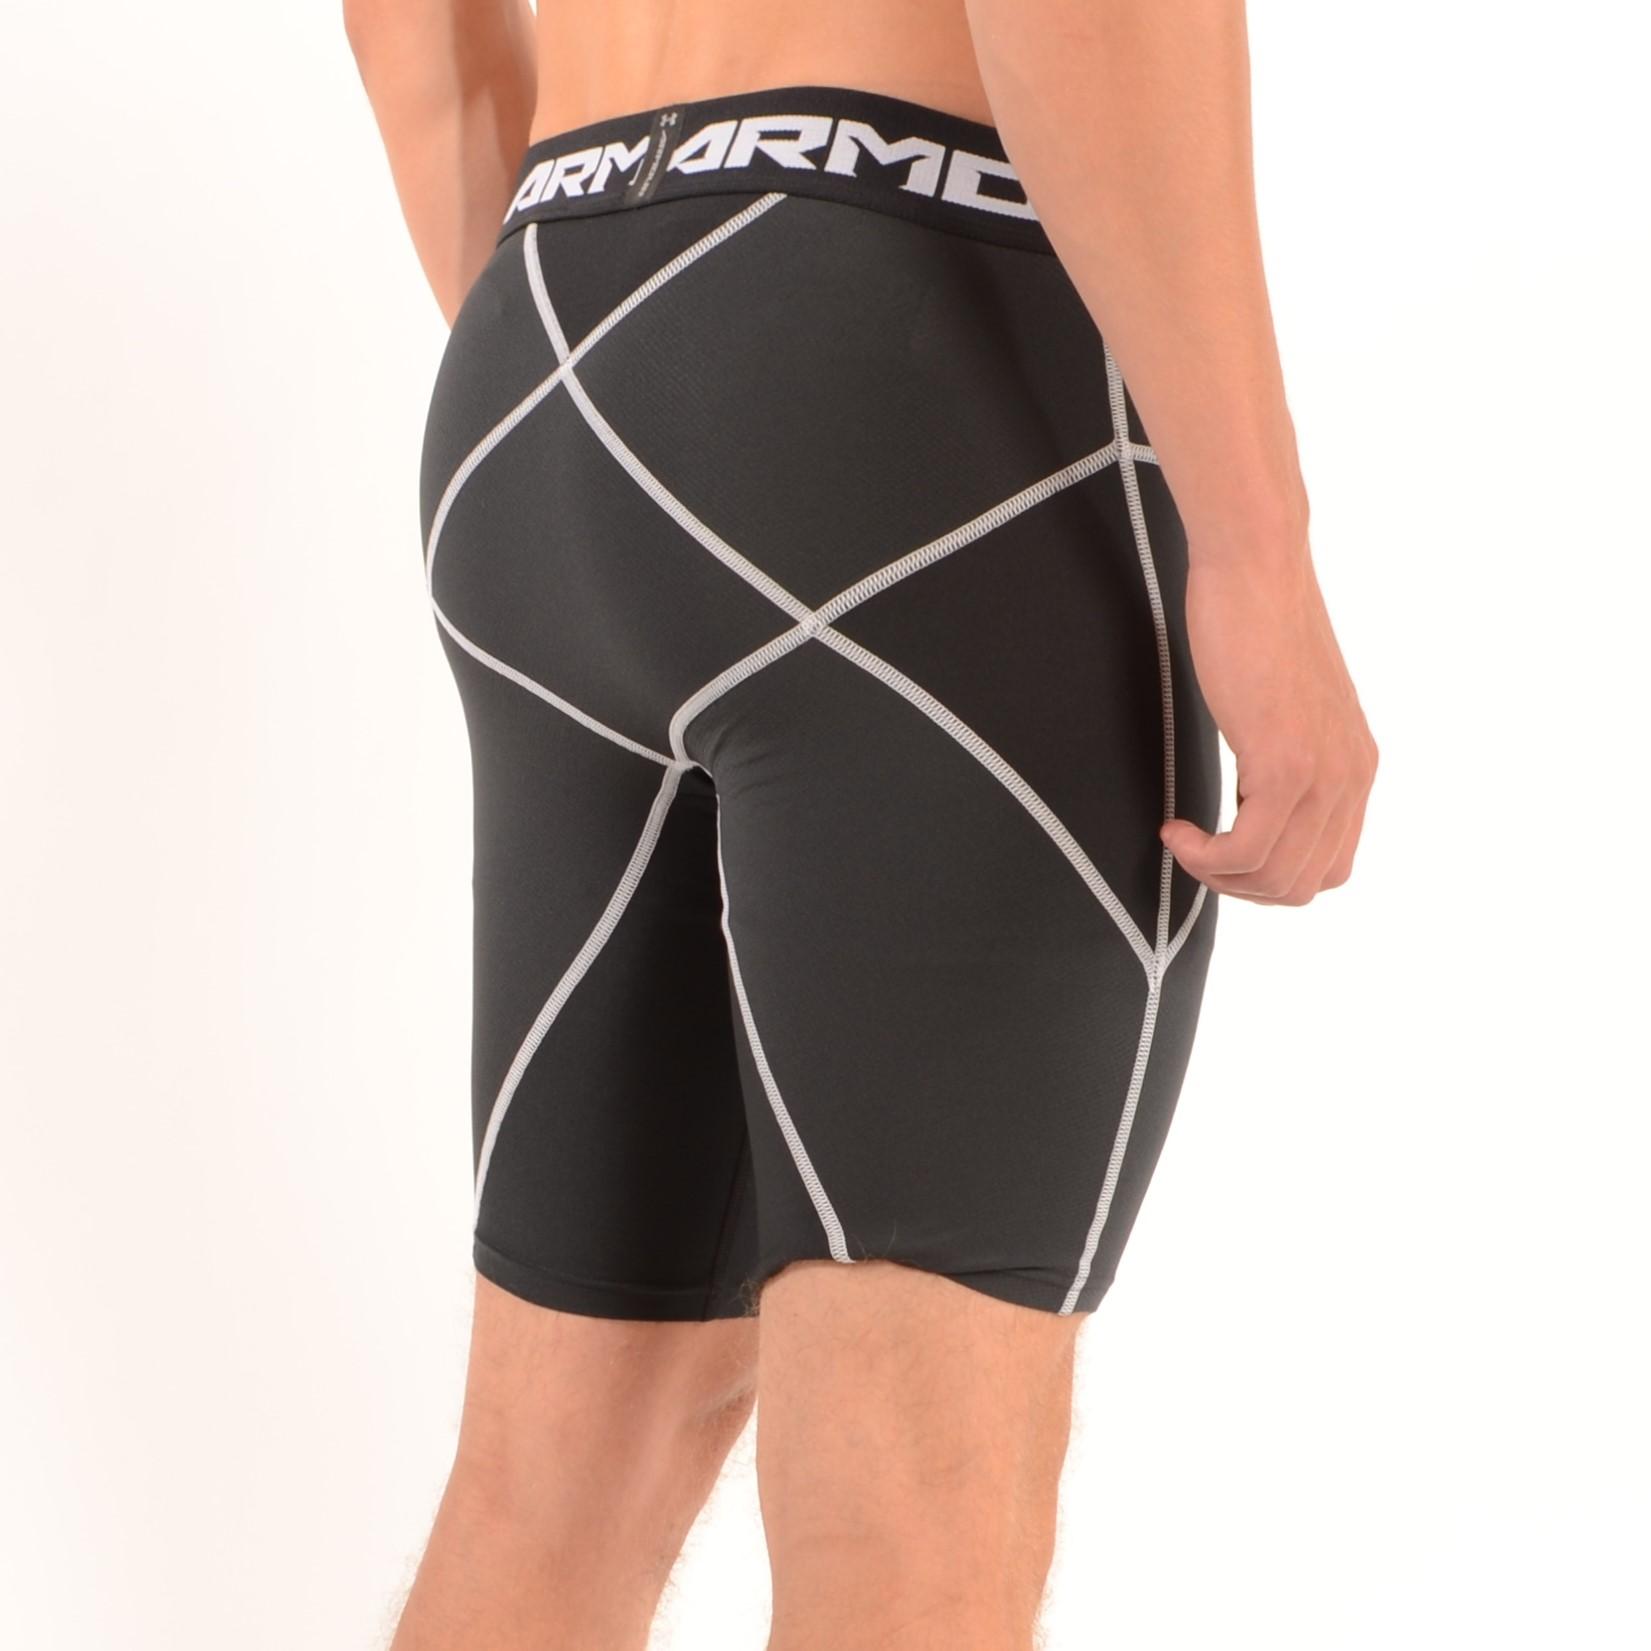 Men/'s UNDER ARMOUR Heat Gear Compression Core Shorts Black Size Large BNWT